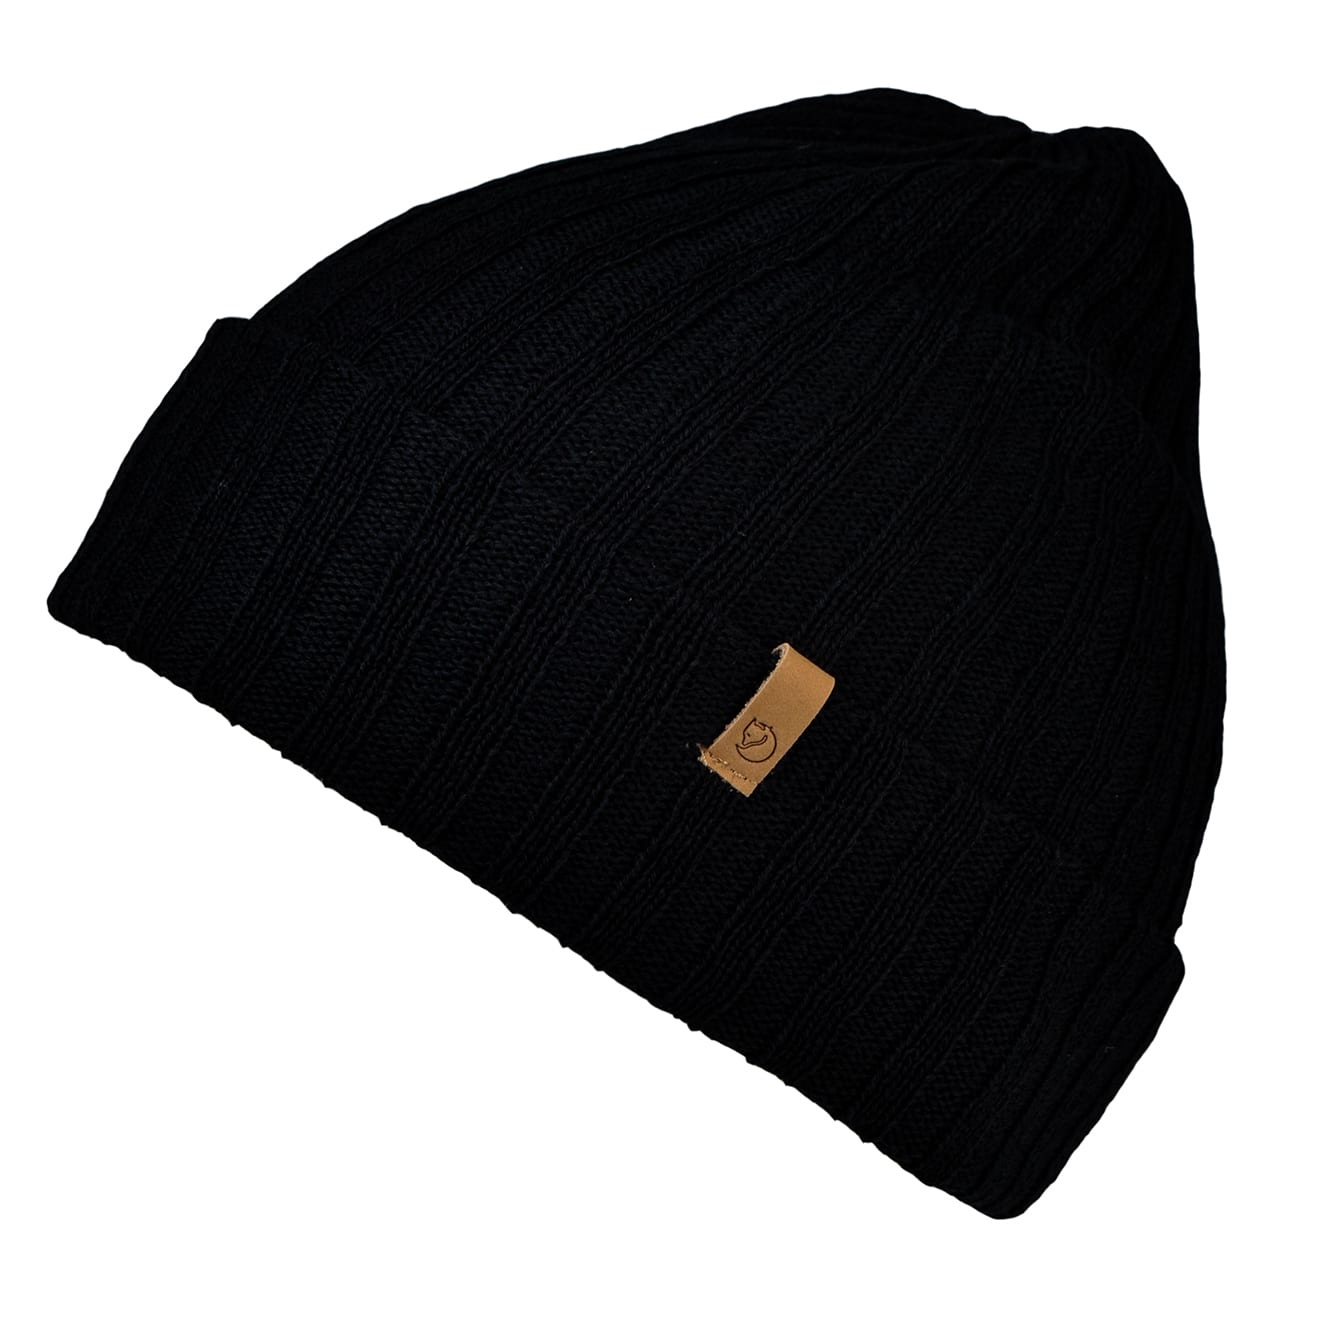 Fjallraven byron hat thin black